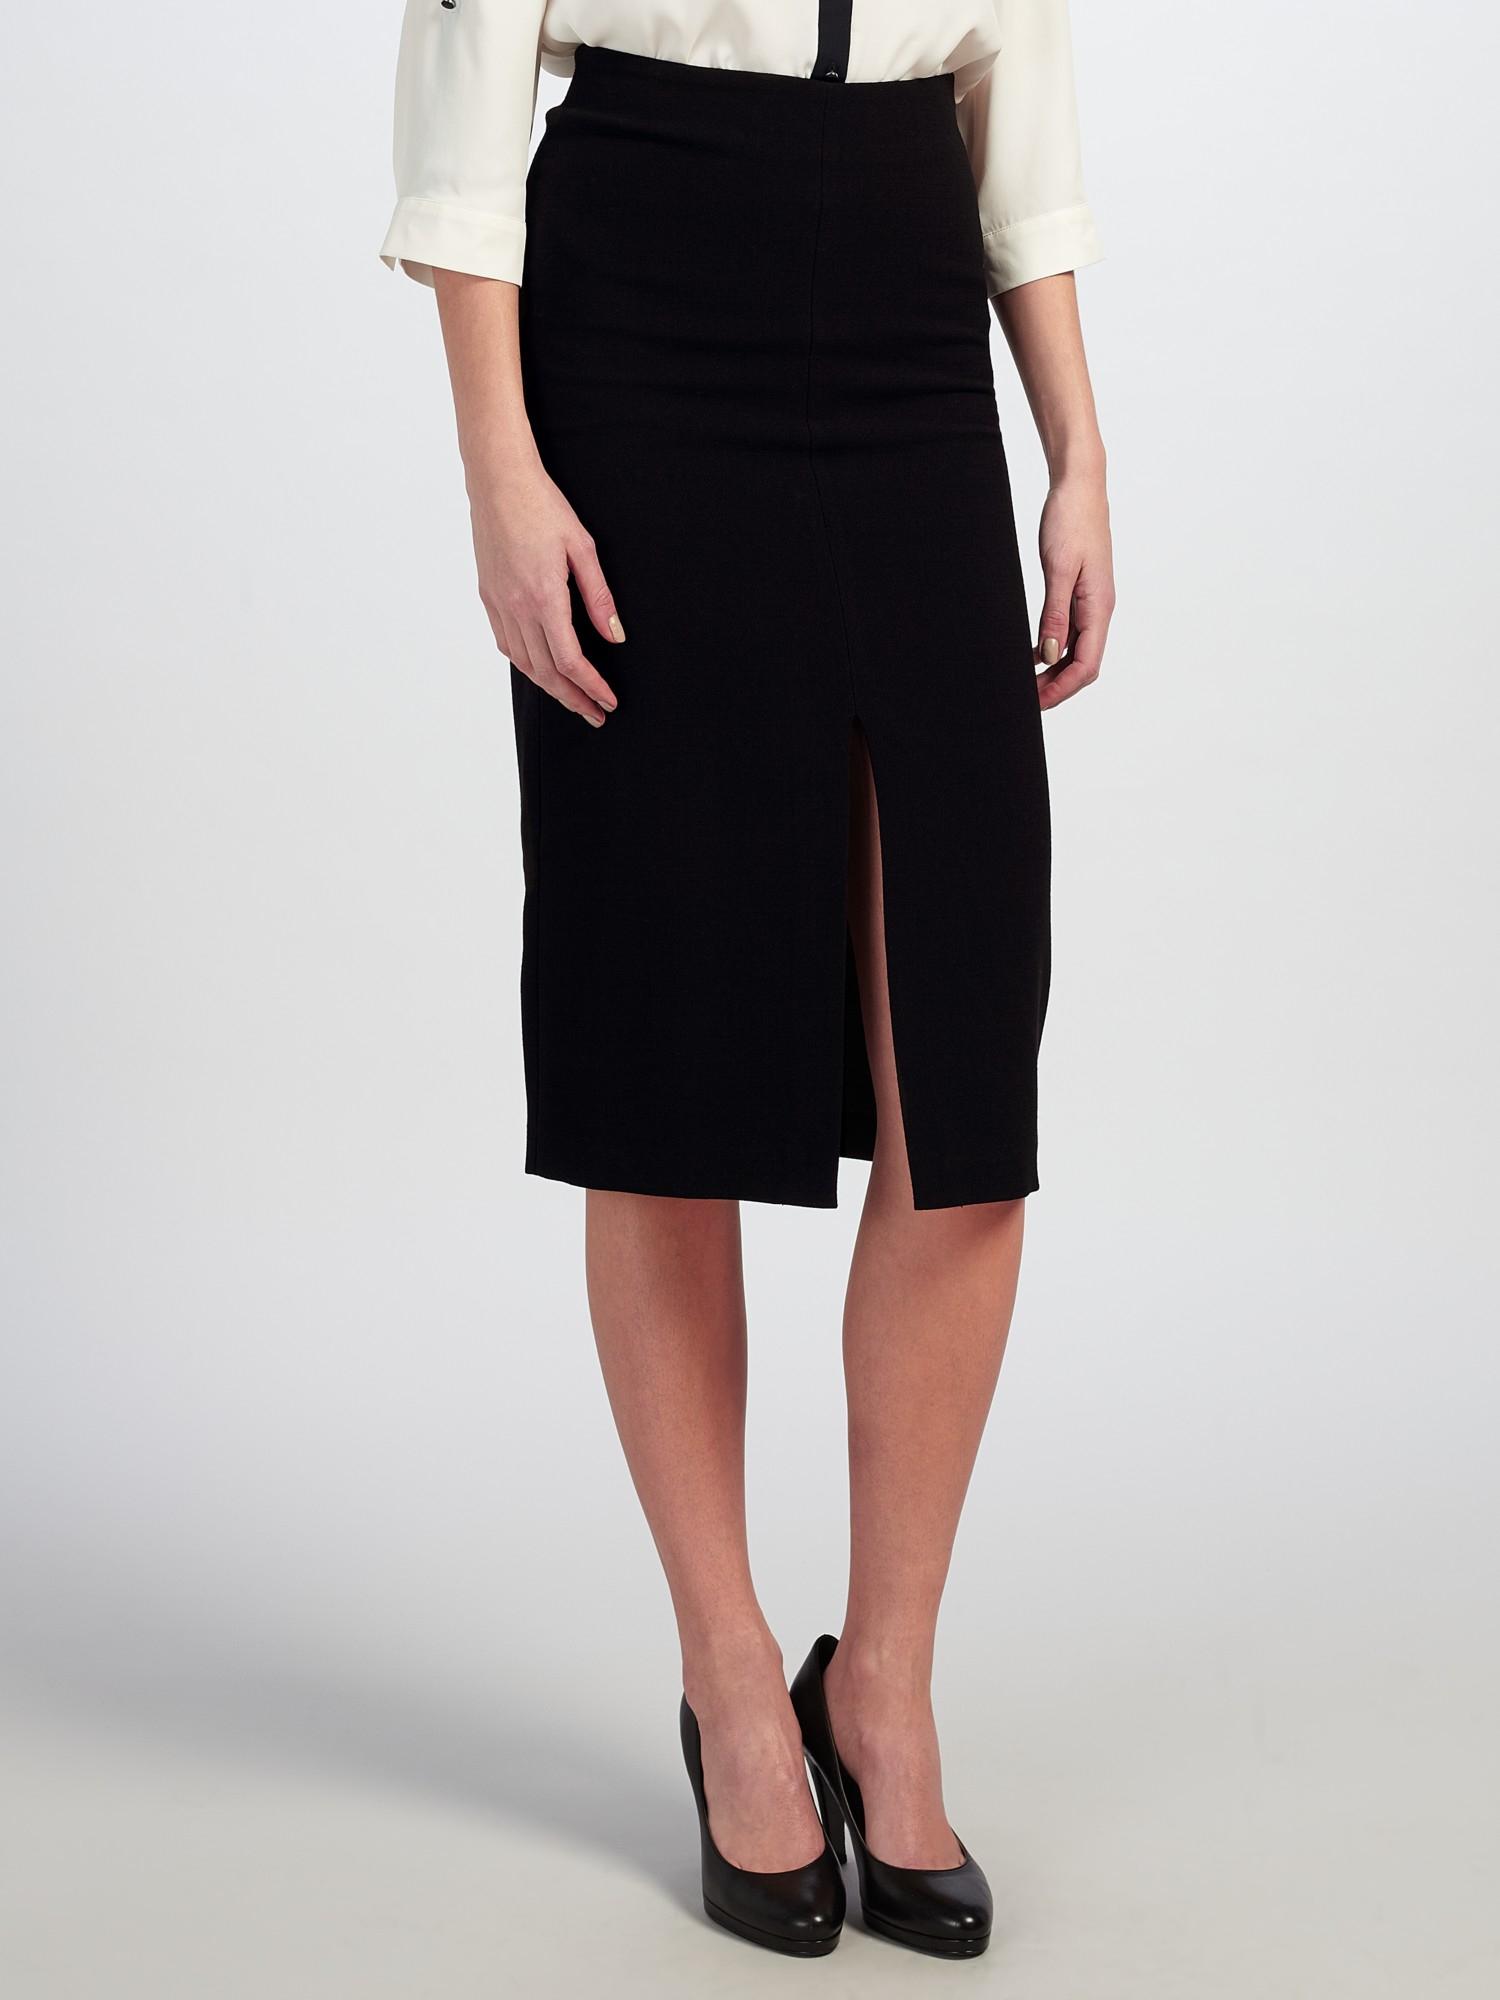 selected soma midi split skirt in black lyst